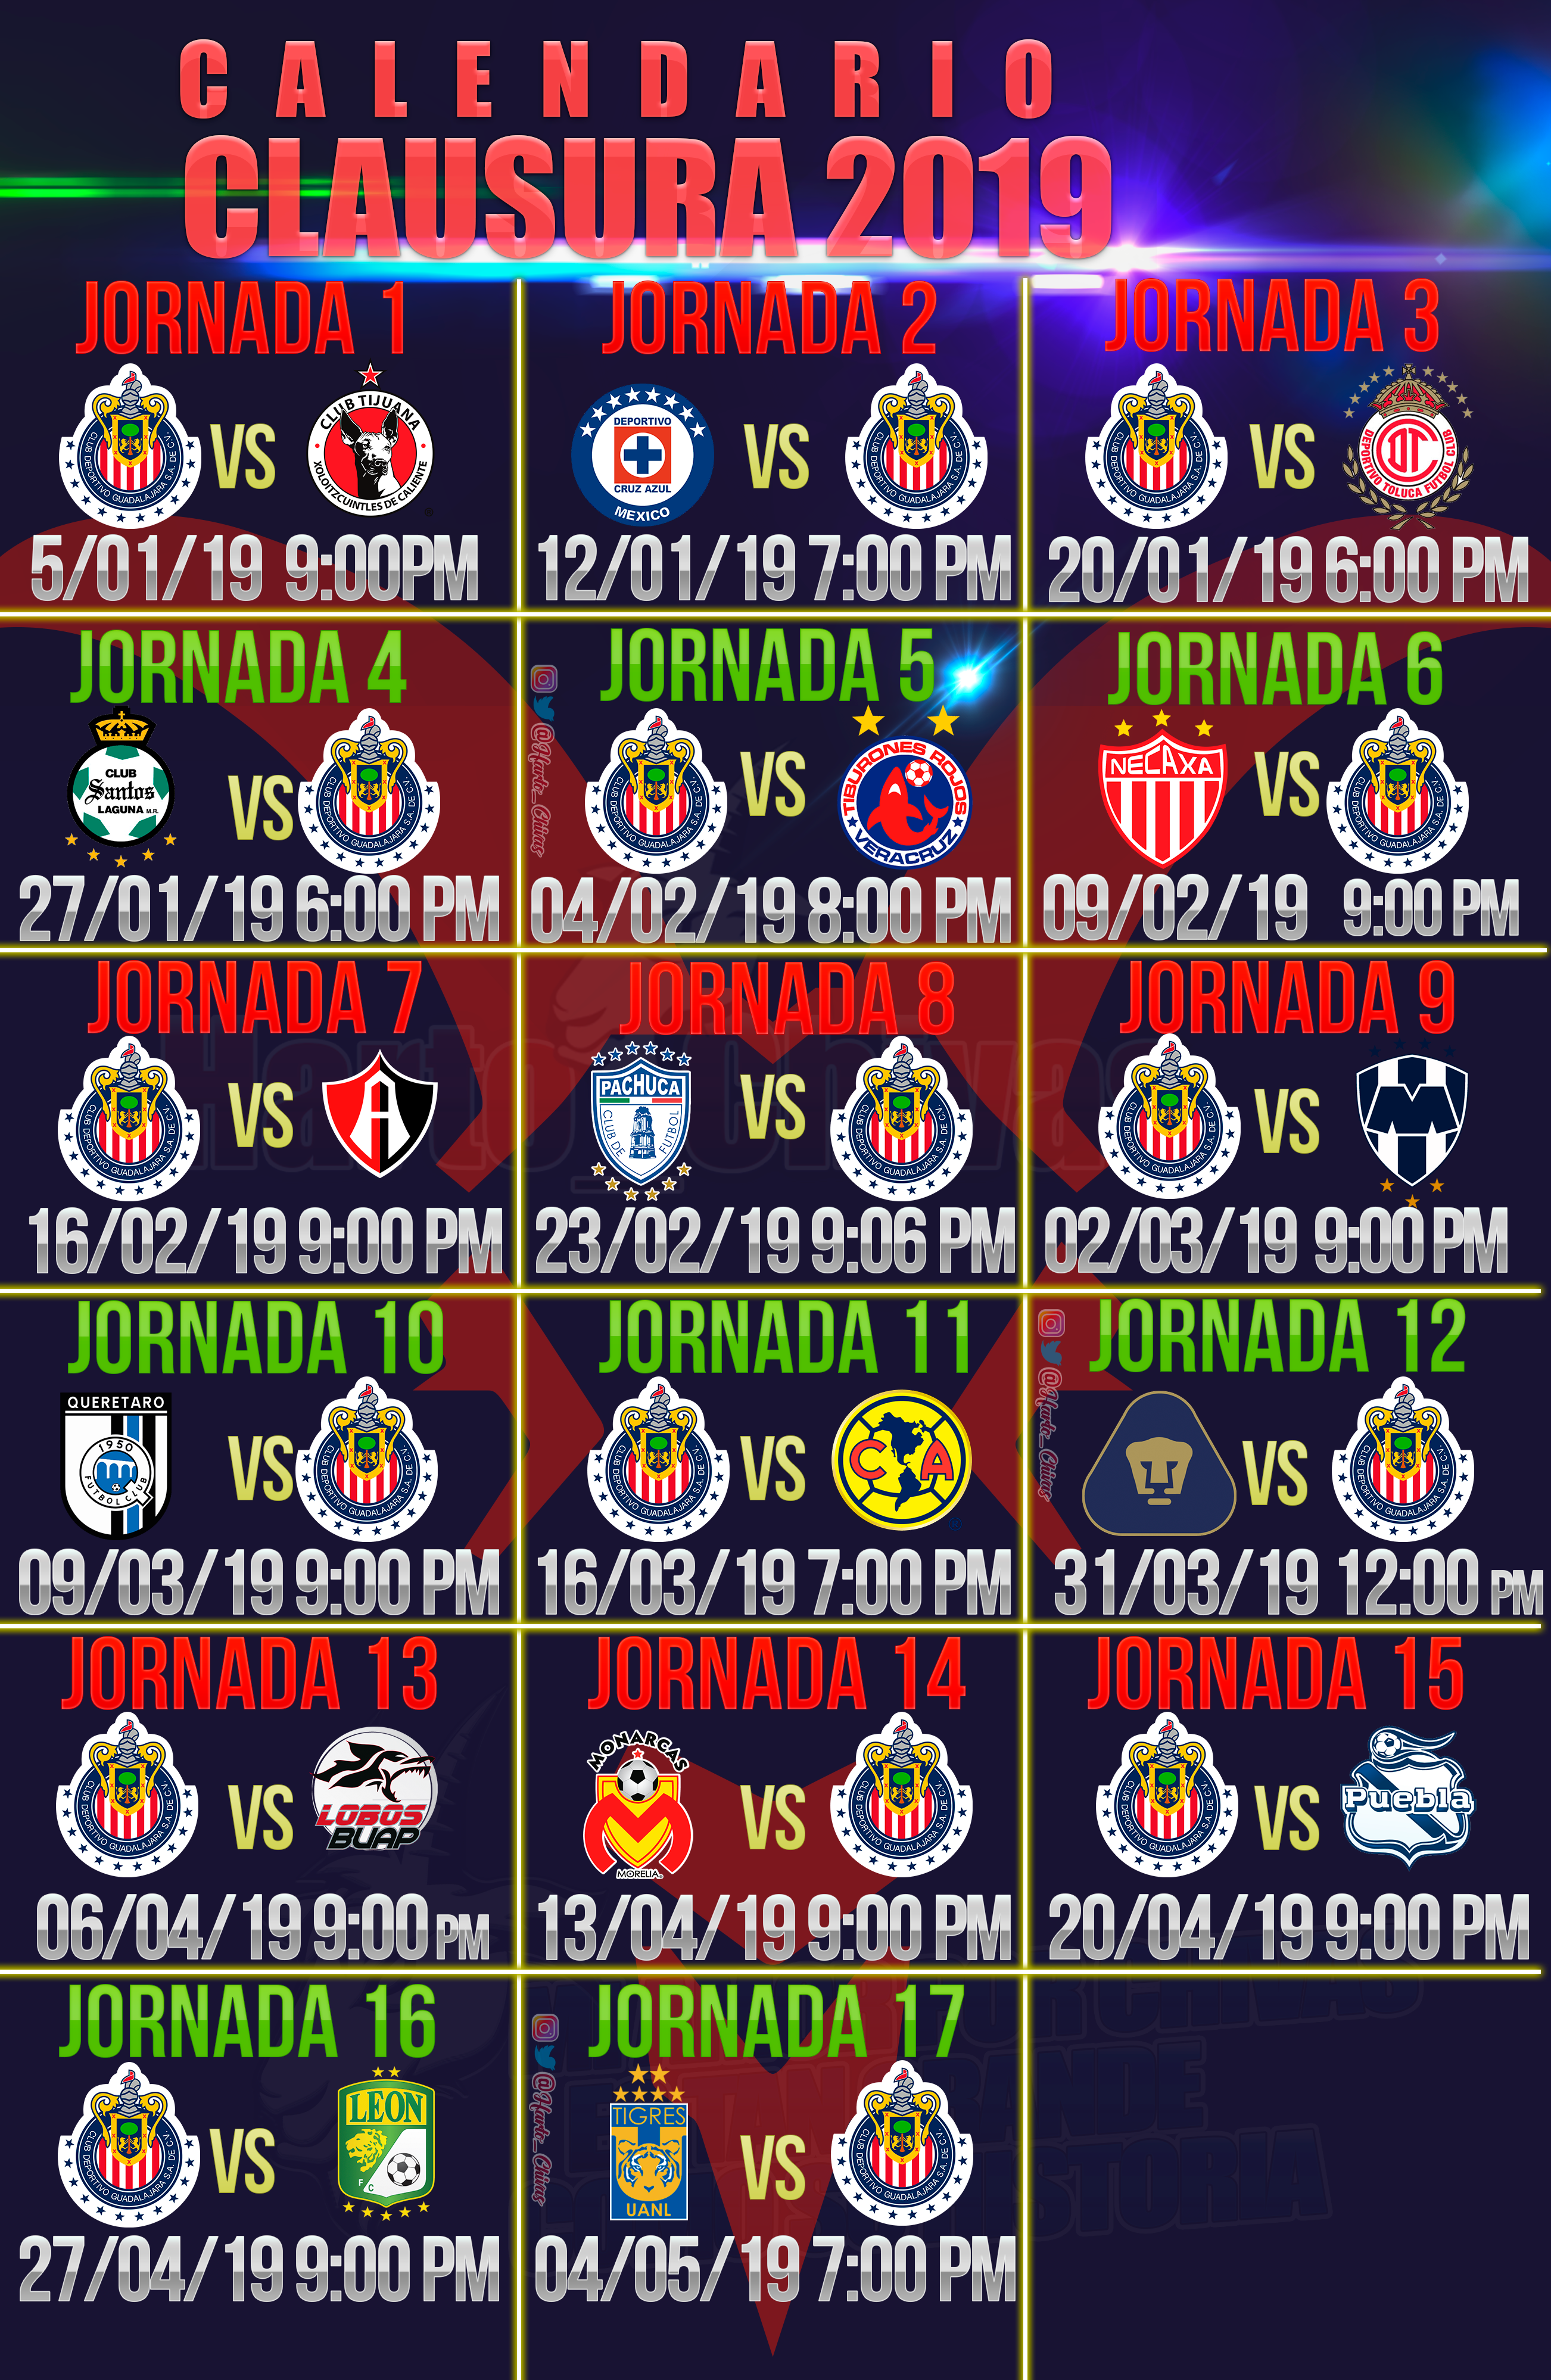 Calendario 2019 Ucl.Calendario Chivas Clausura 2019 Jersey 2018 2019 Chivas